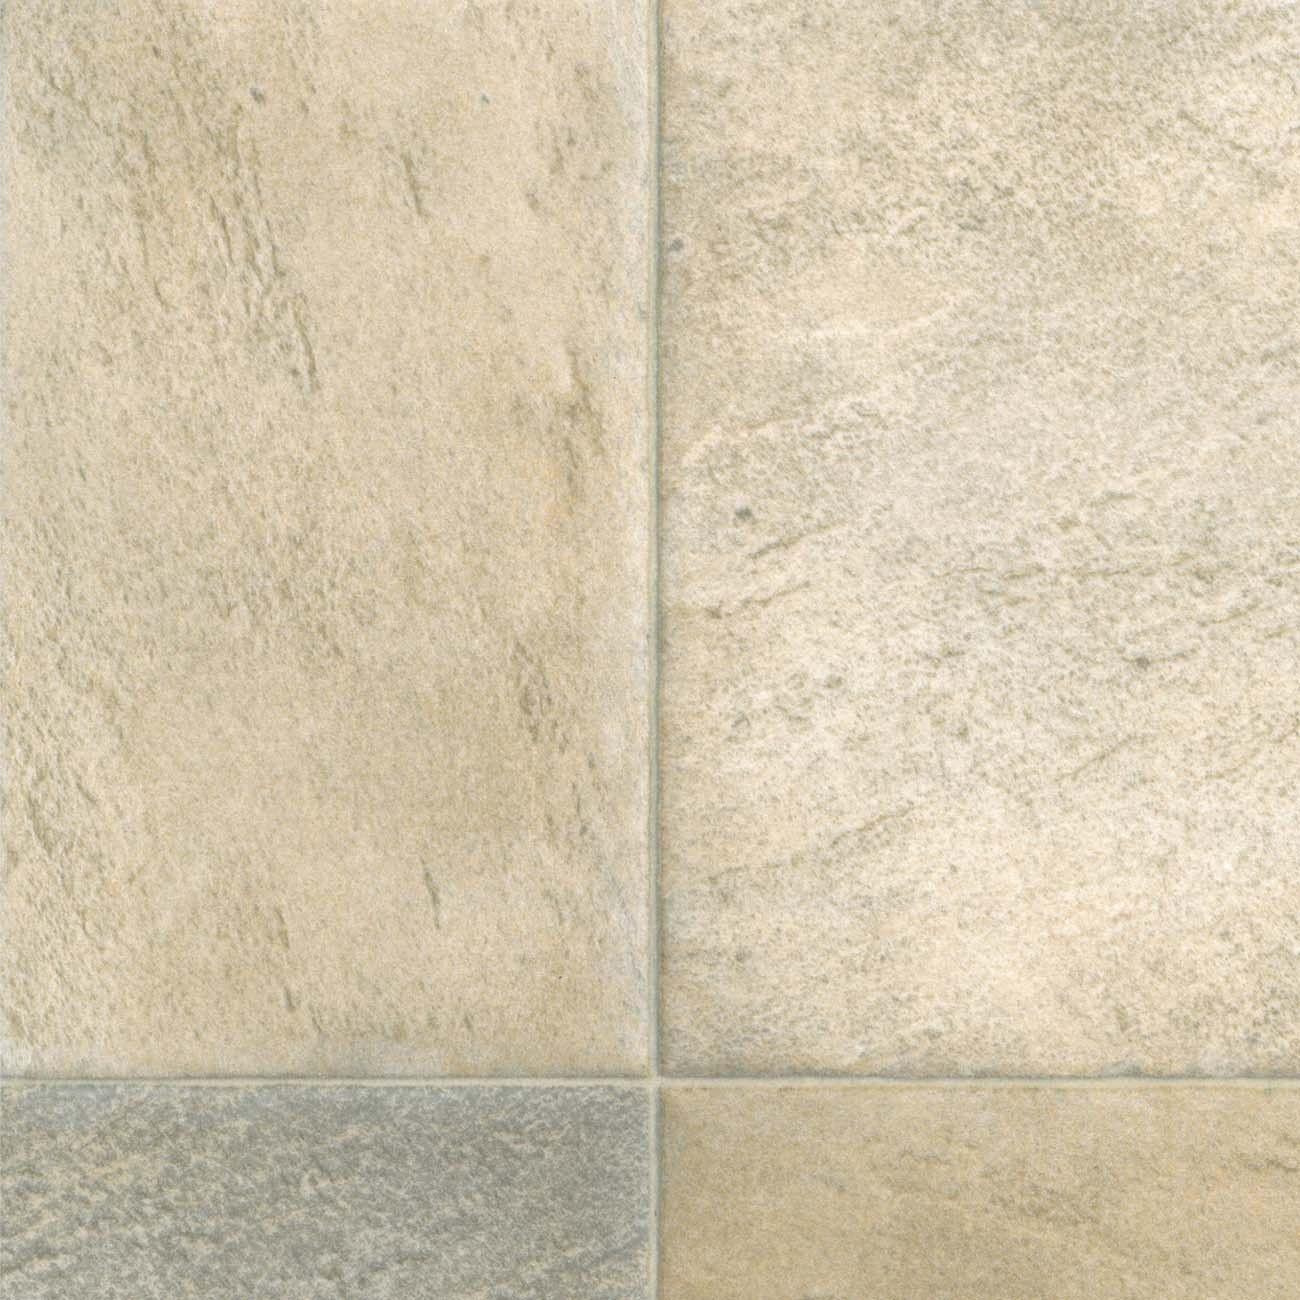 A statement resilient floor, this Non Slip vinyl flooring